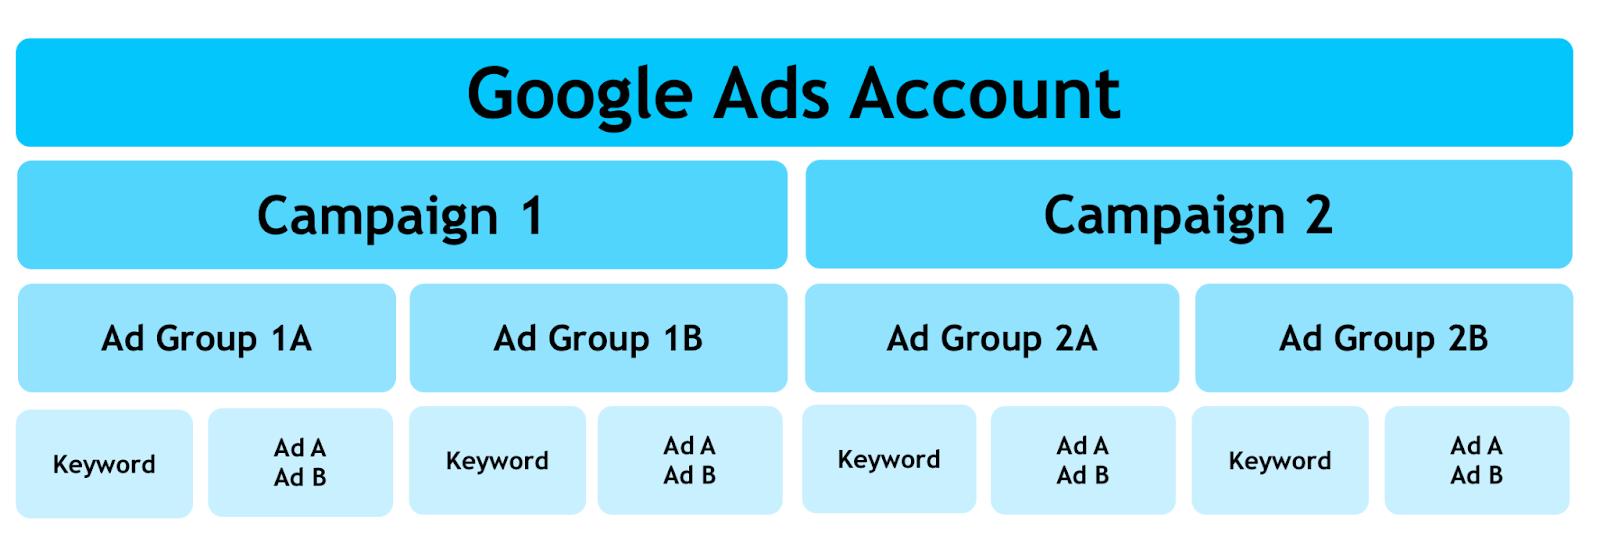 B2B Google Ads - google ads account structure